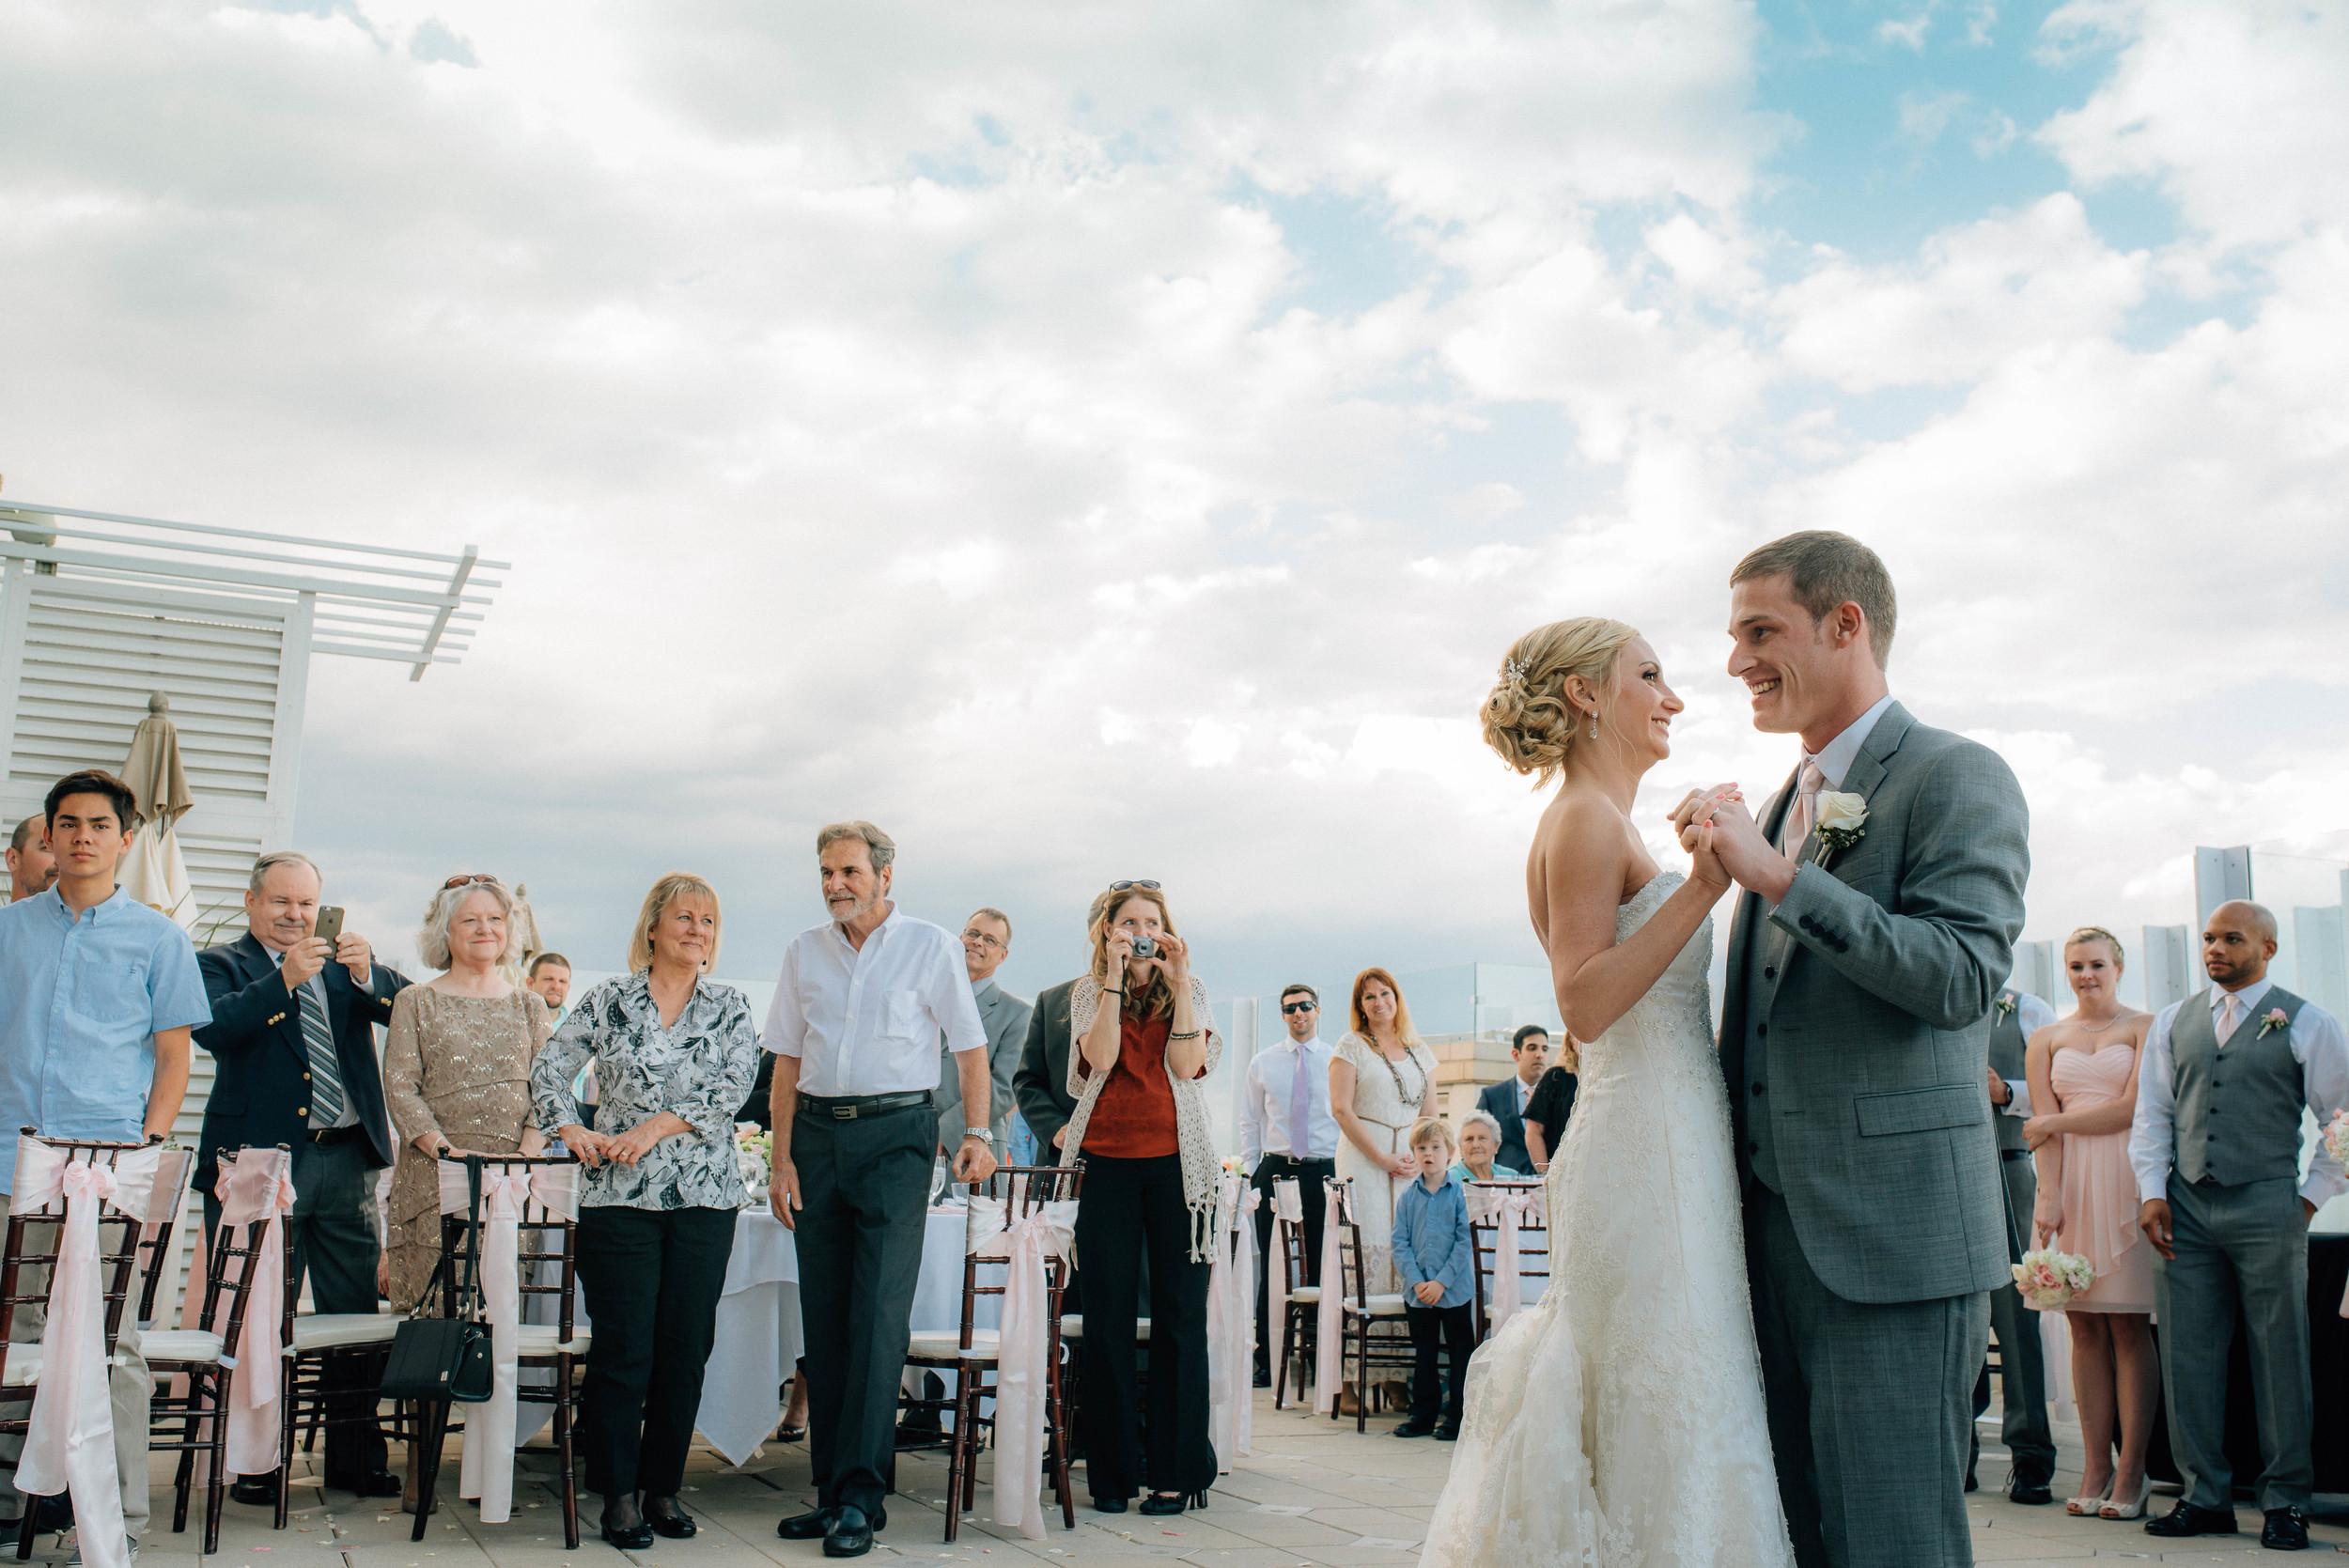 virginia-beach-wedding-photographer-melissa-bliss-photography-norfolk-portsmouth-chesapeake-suffolk-williamsburg-wedding-photographers-beach-wedding